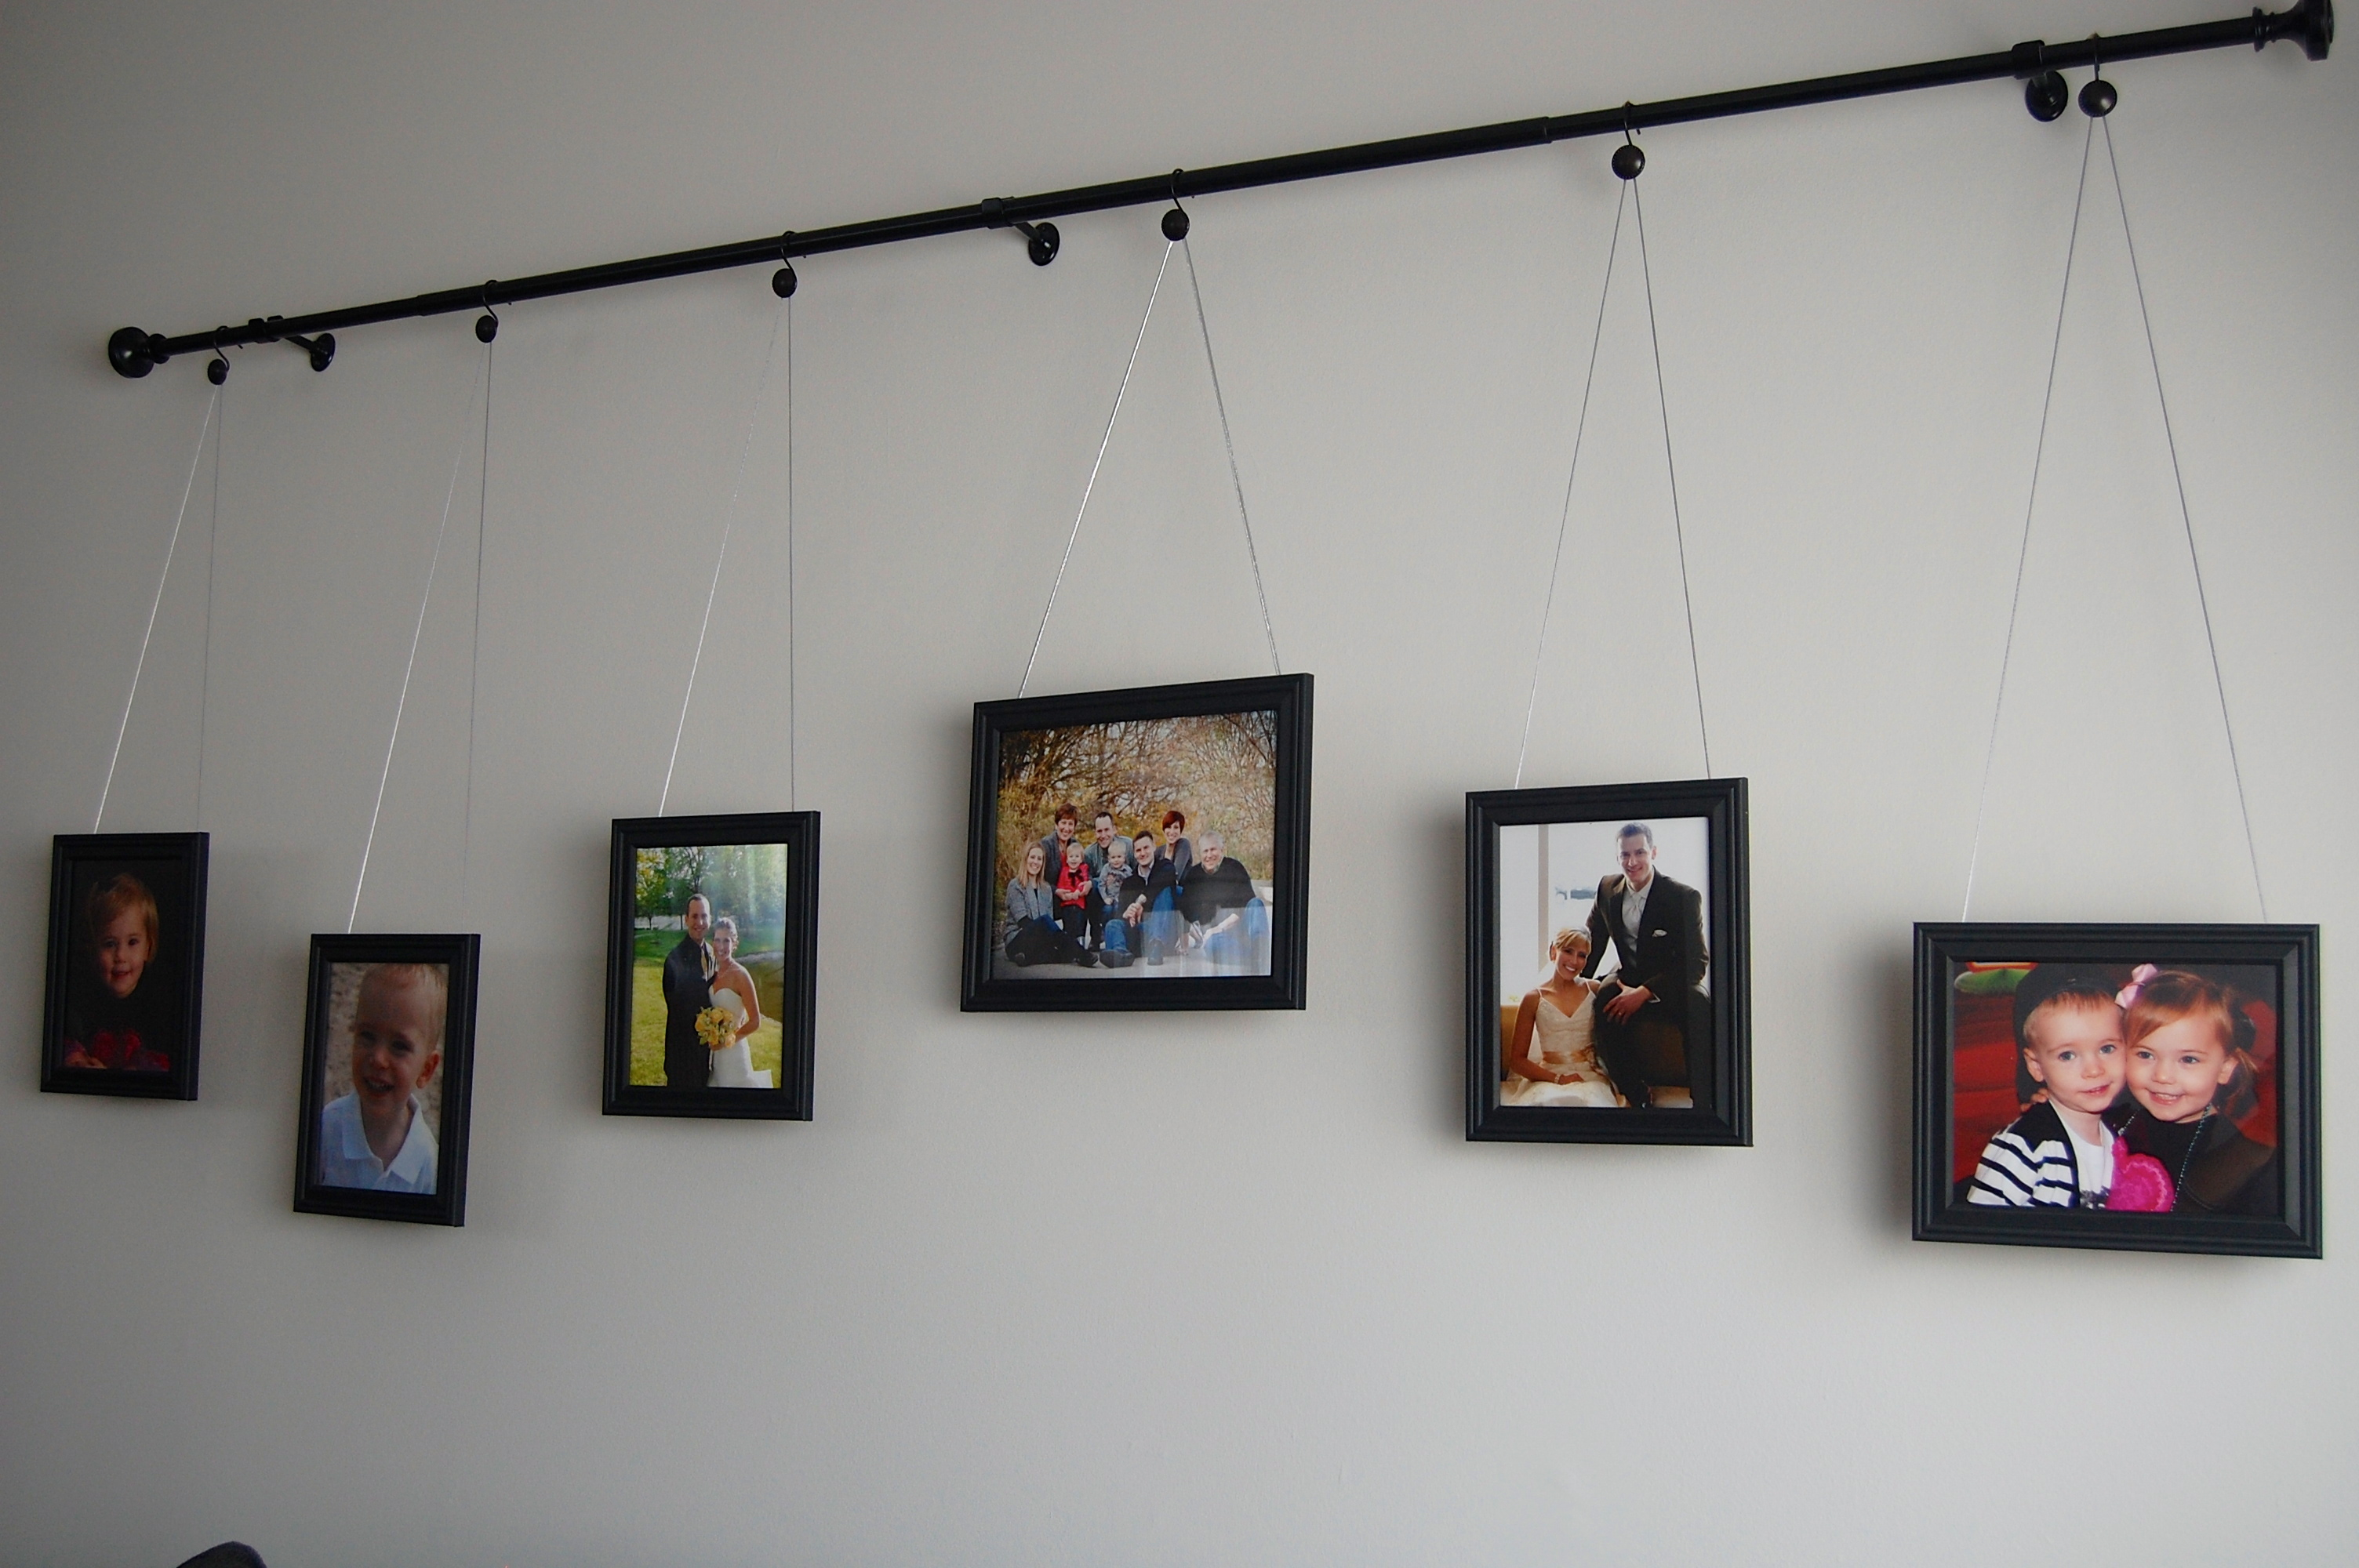 Diy curtain rod gallery wall for Curtain display ideas